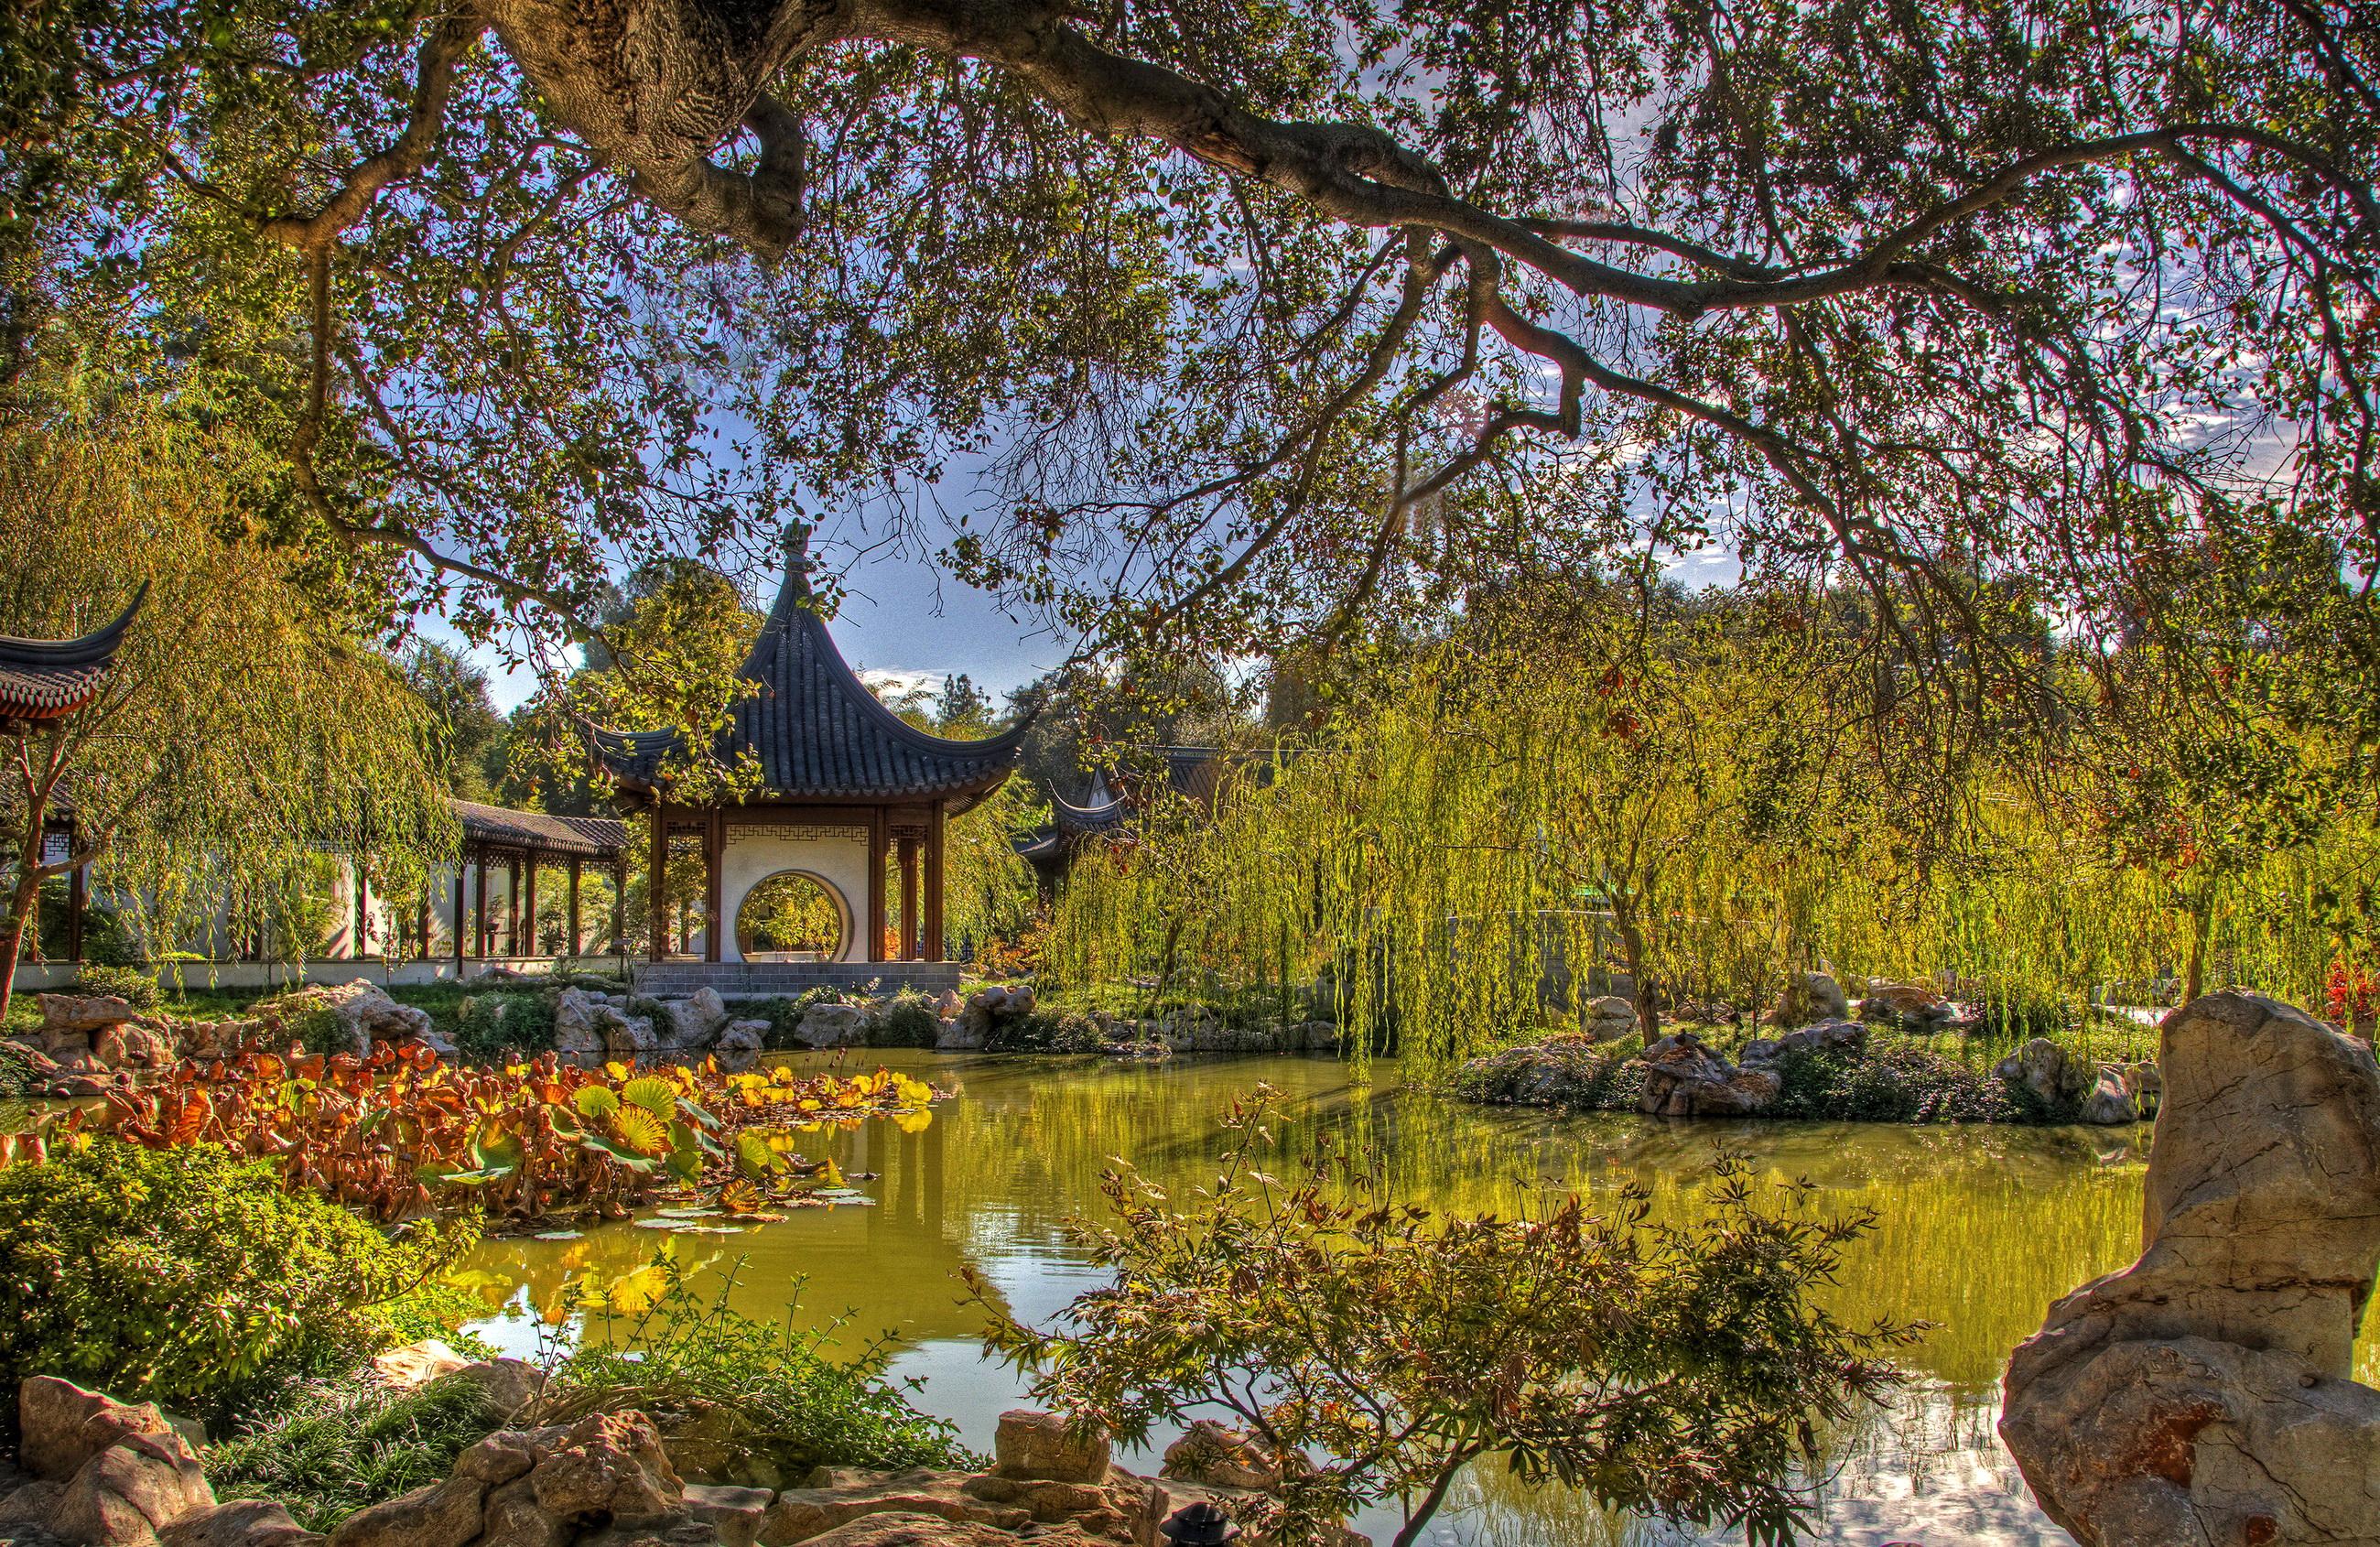 chinese garden wallpaper in hd - photo #15